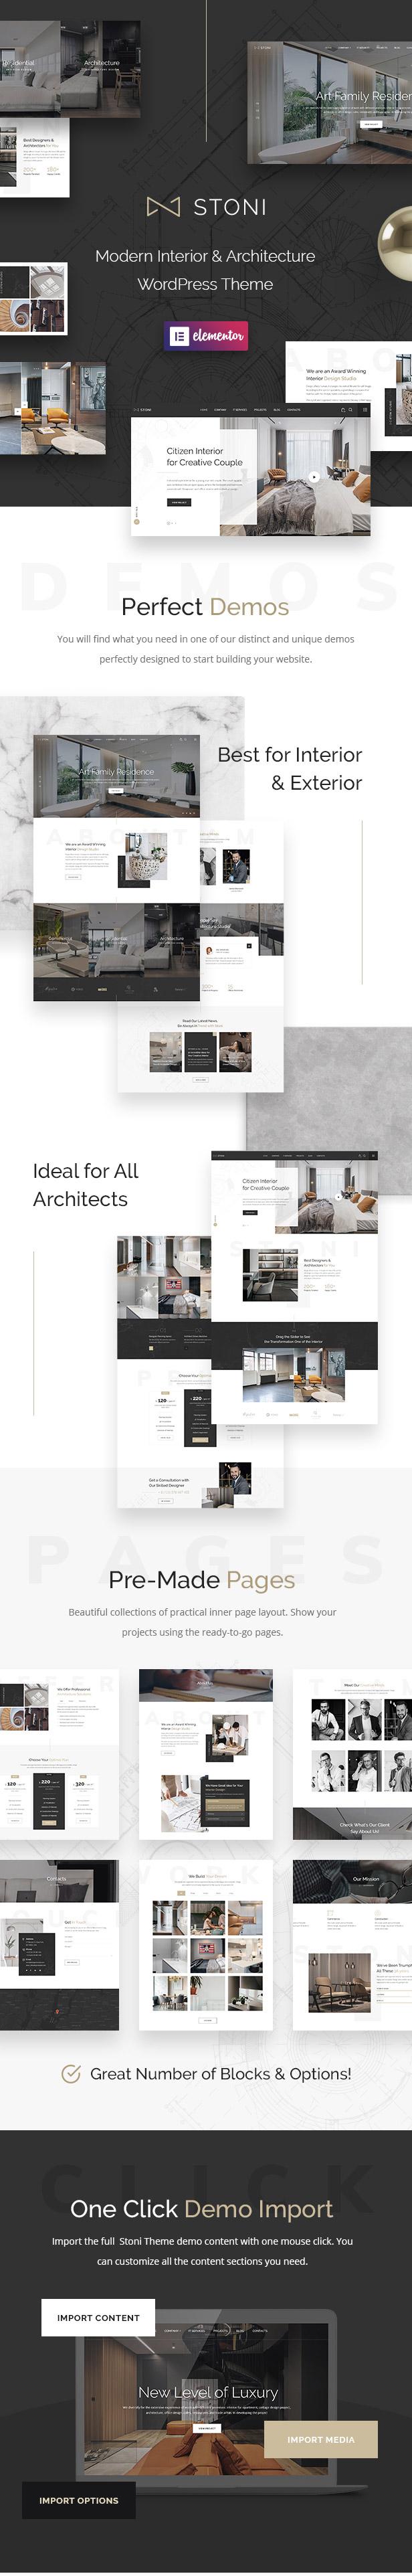 Stoni - Architecture & Interior Design Agency WordPress Theme - 2